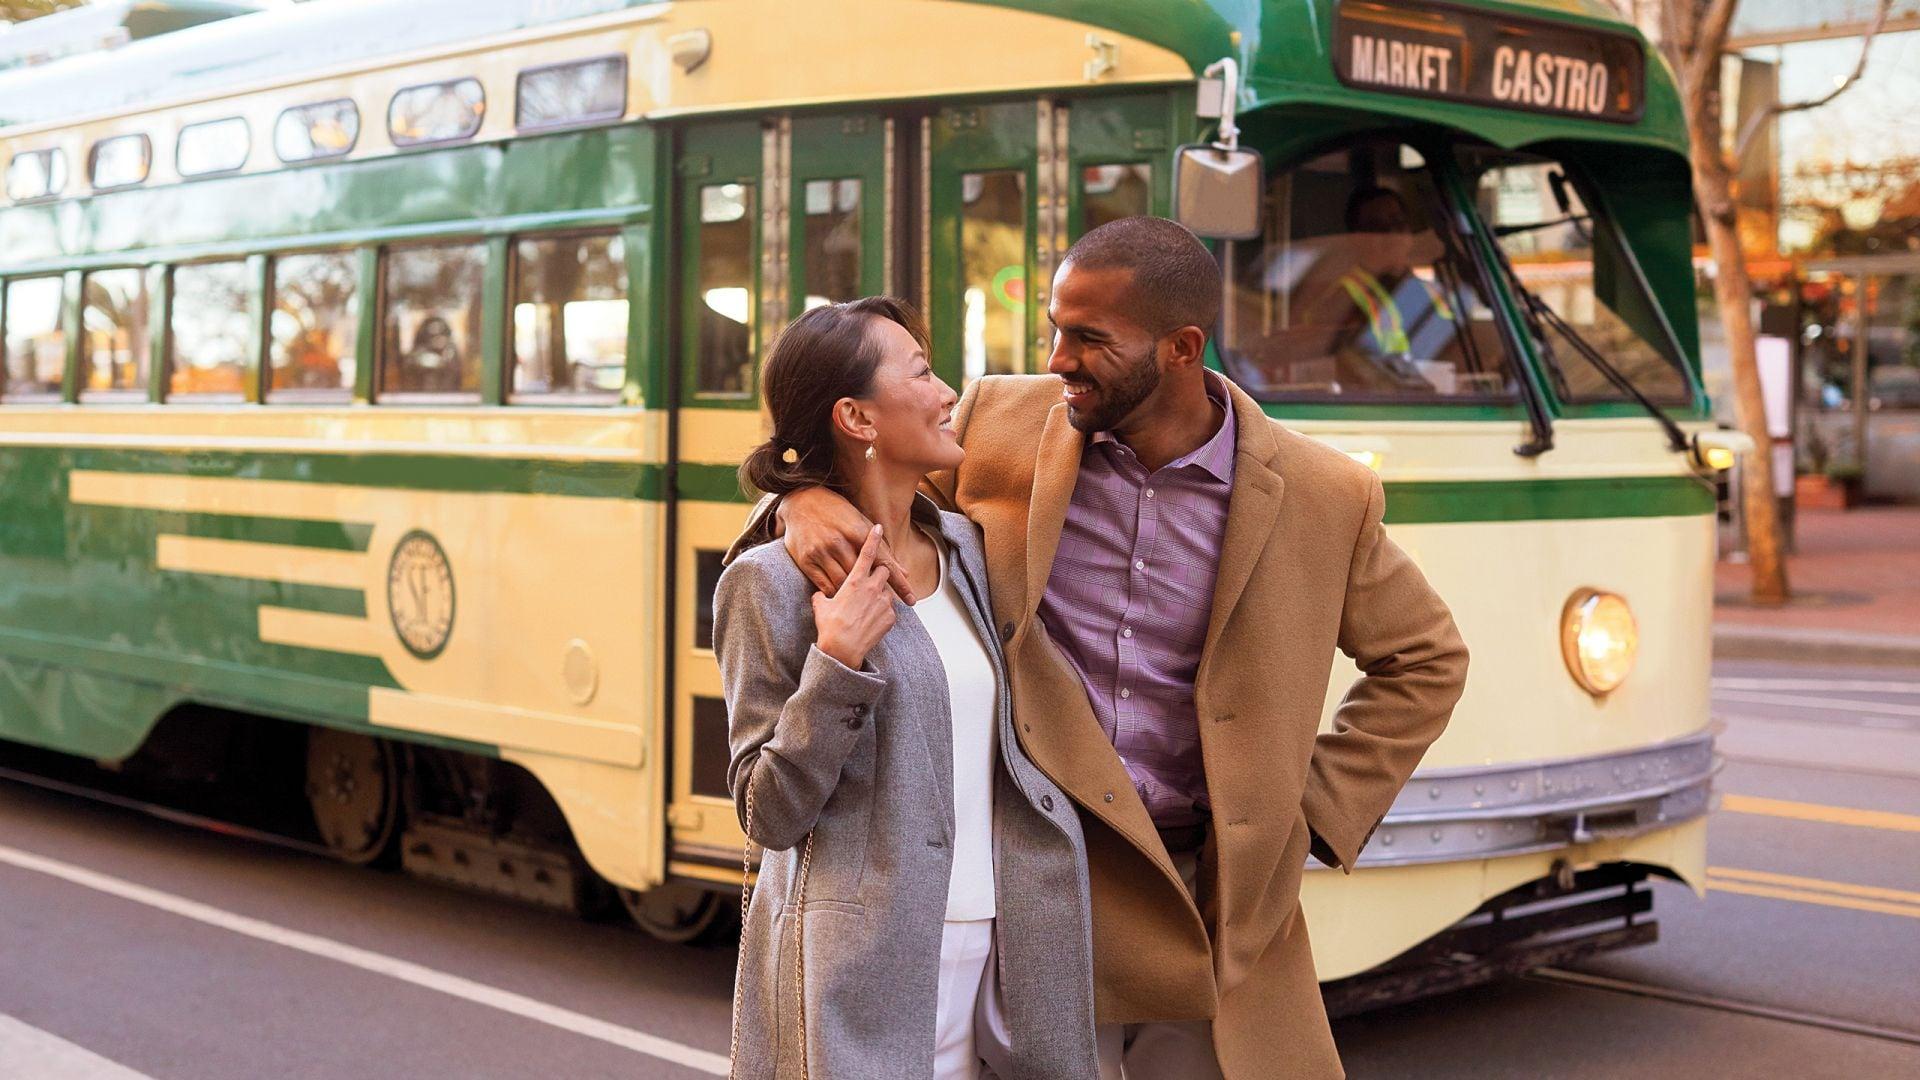 Grand Hyatt San Francisco Bus Couple